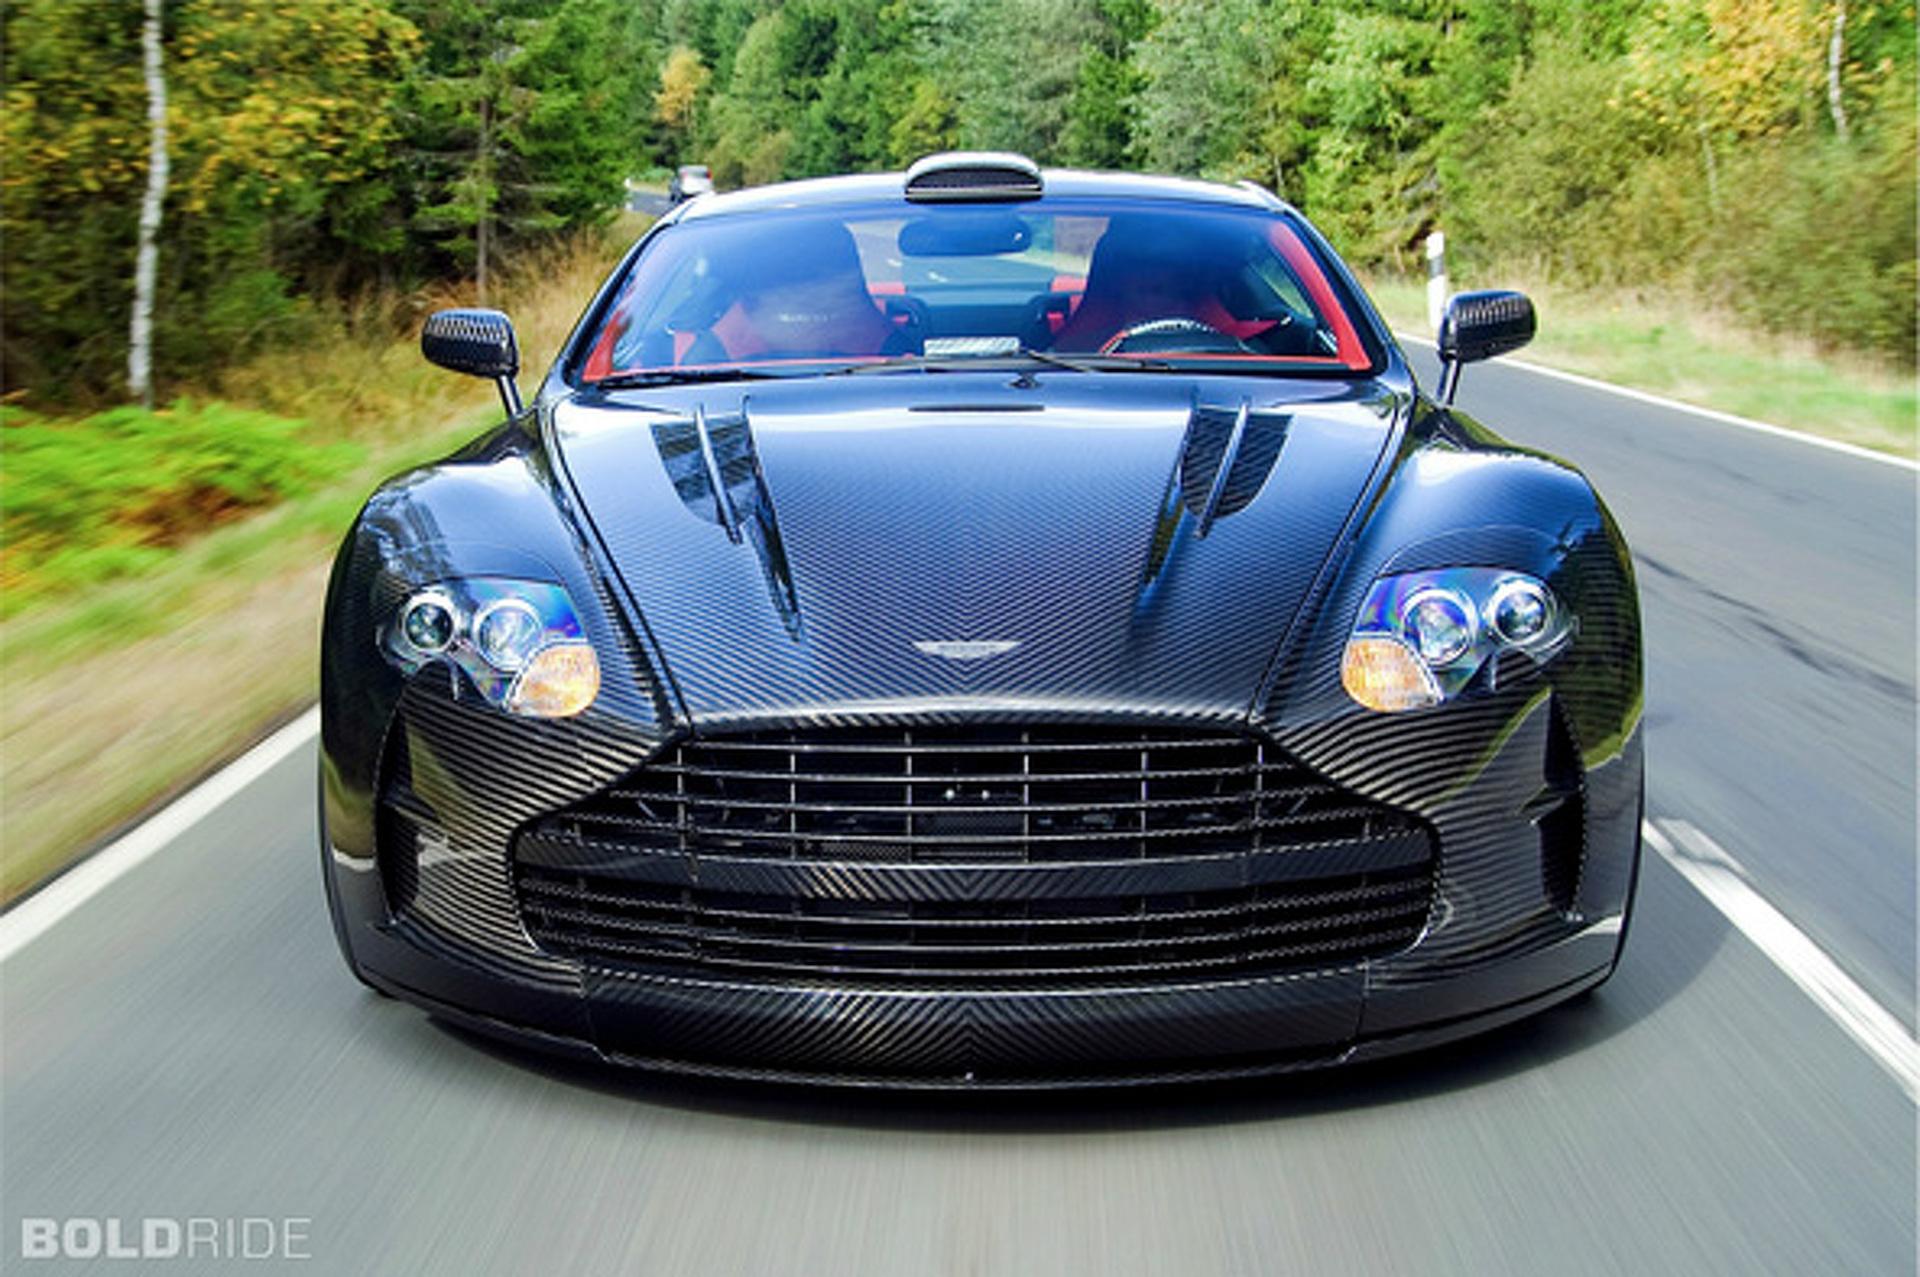 Wheels Wallpaper: Mansory Cyrus Aston Martin